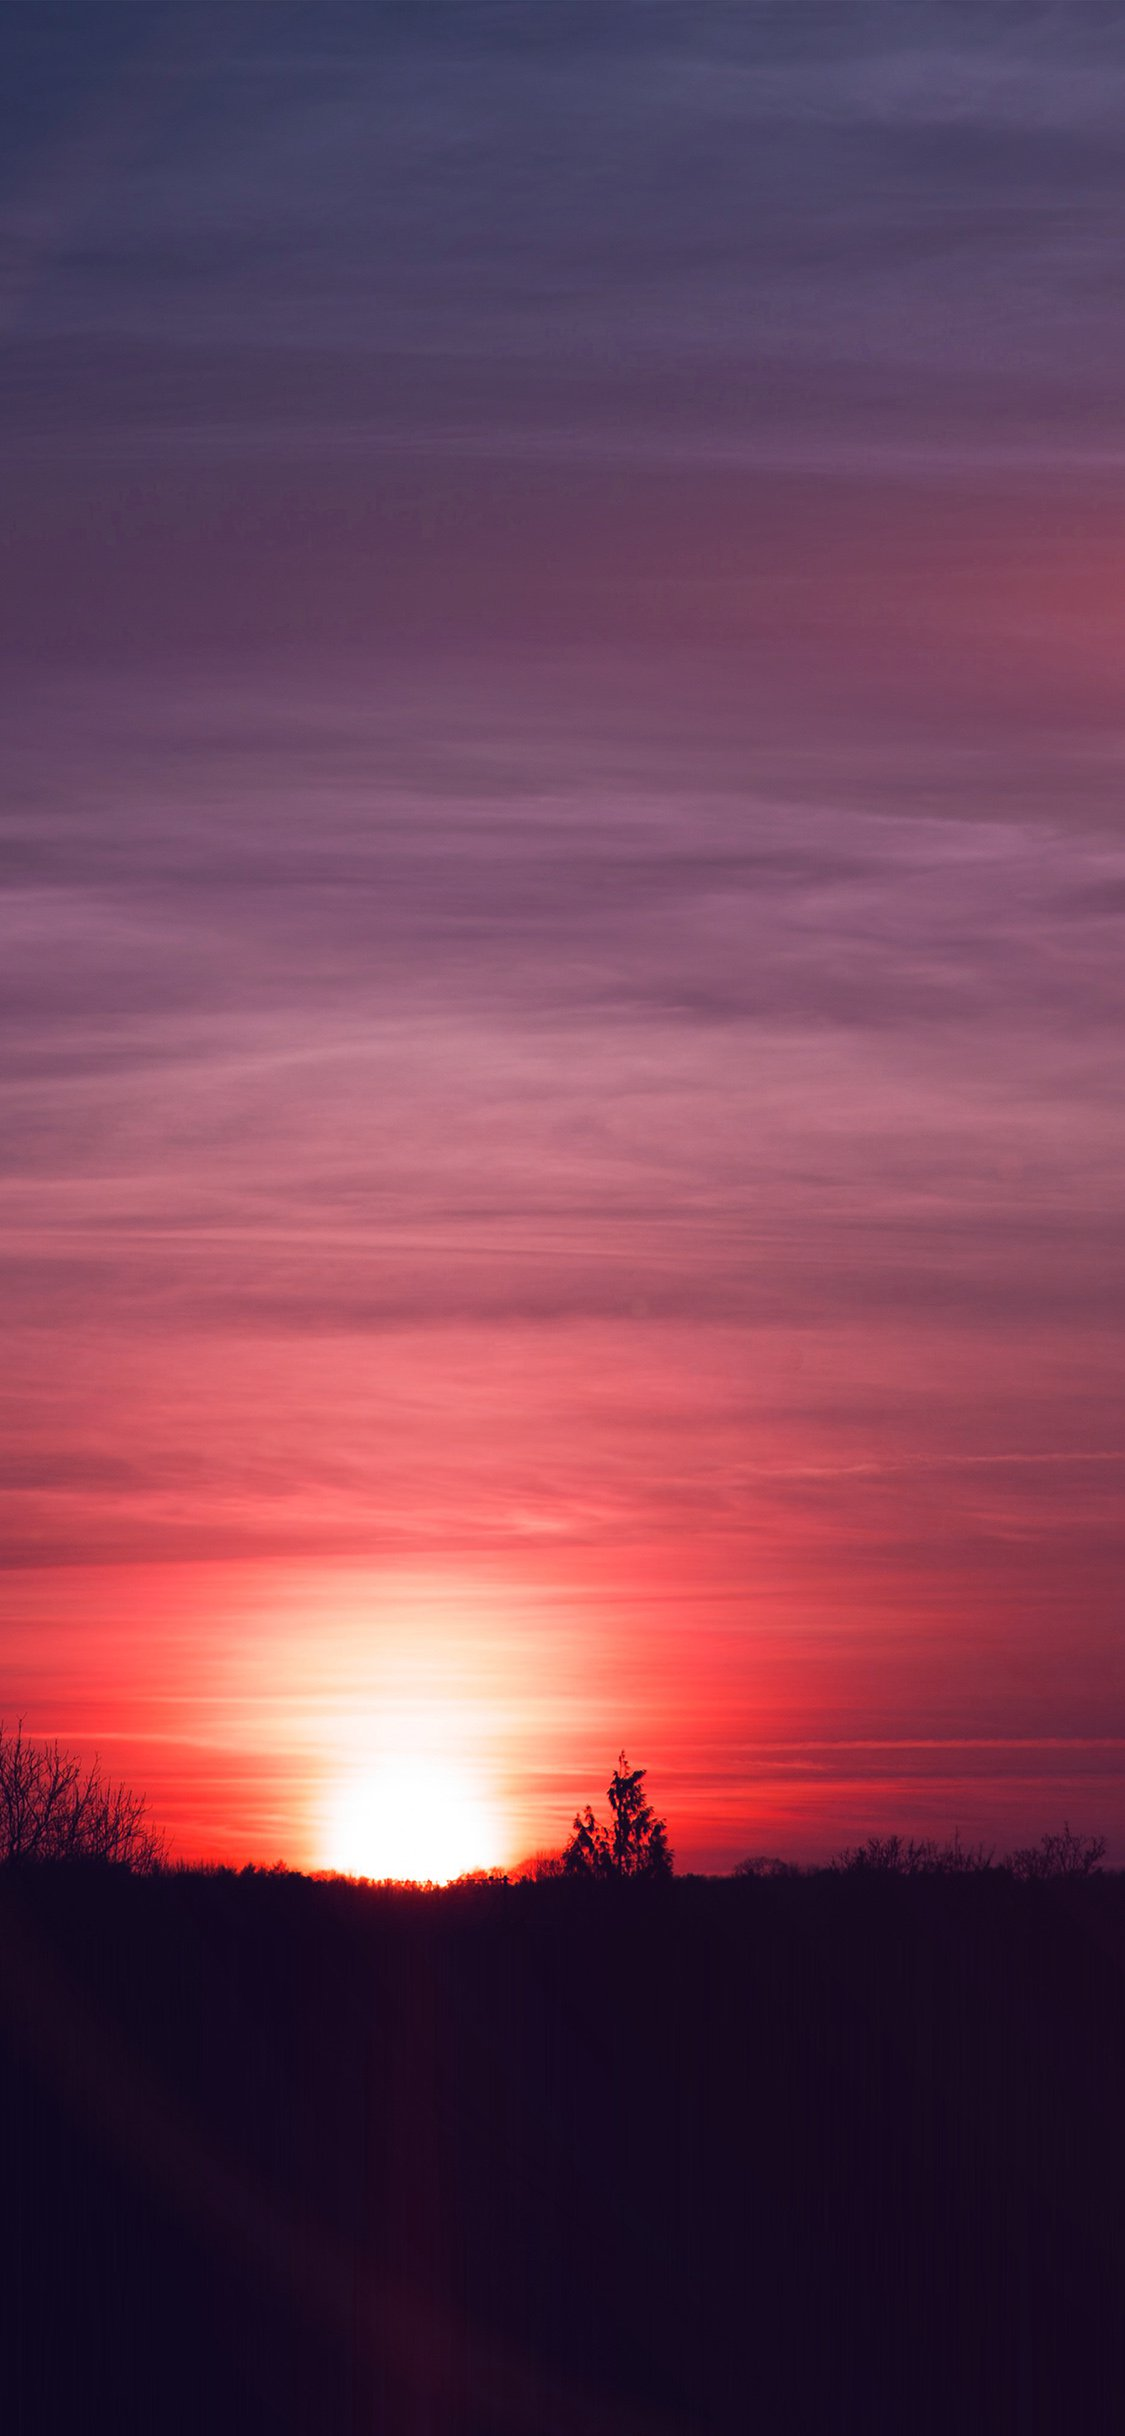 Best Sunset Iphone X Wallpapers Hd Ilikewallpaper